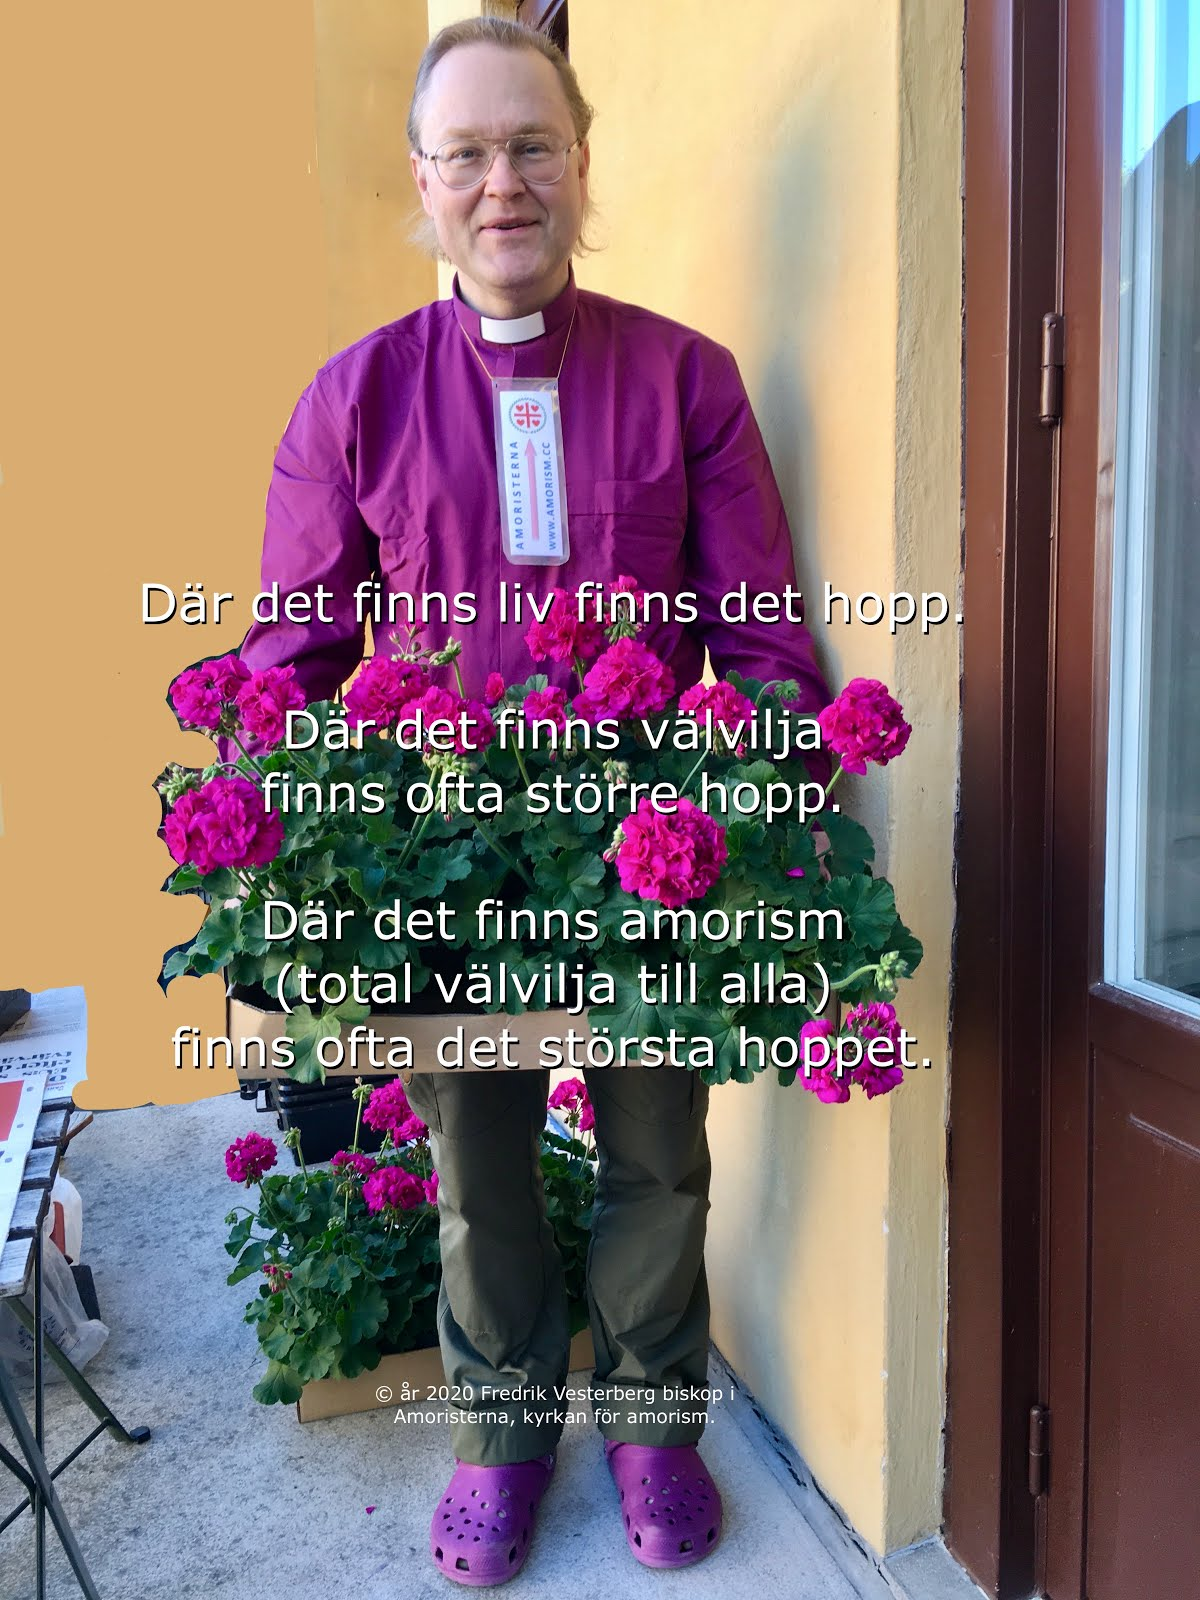 Jpg. biskop Fredrik Vesterberg